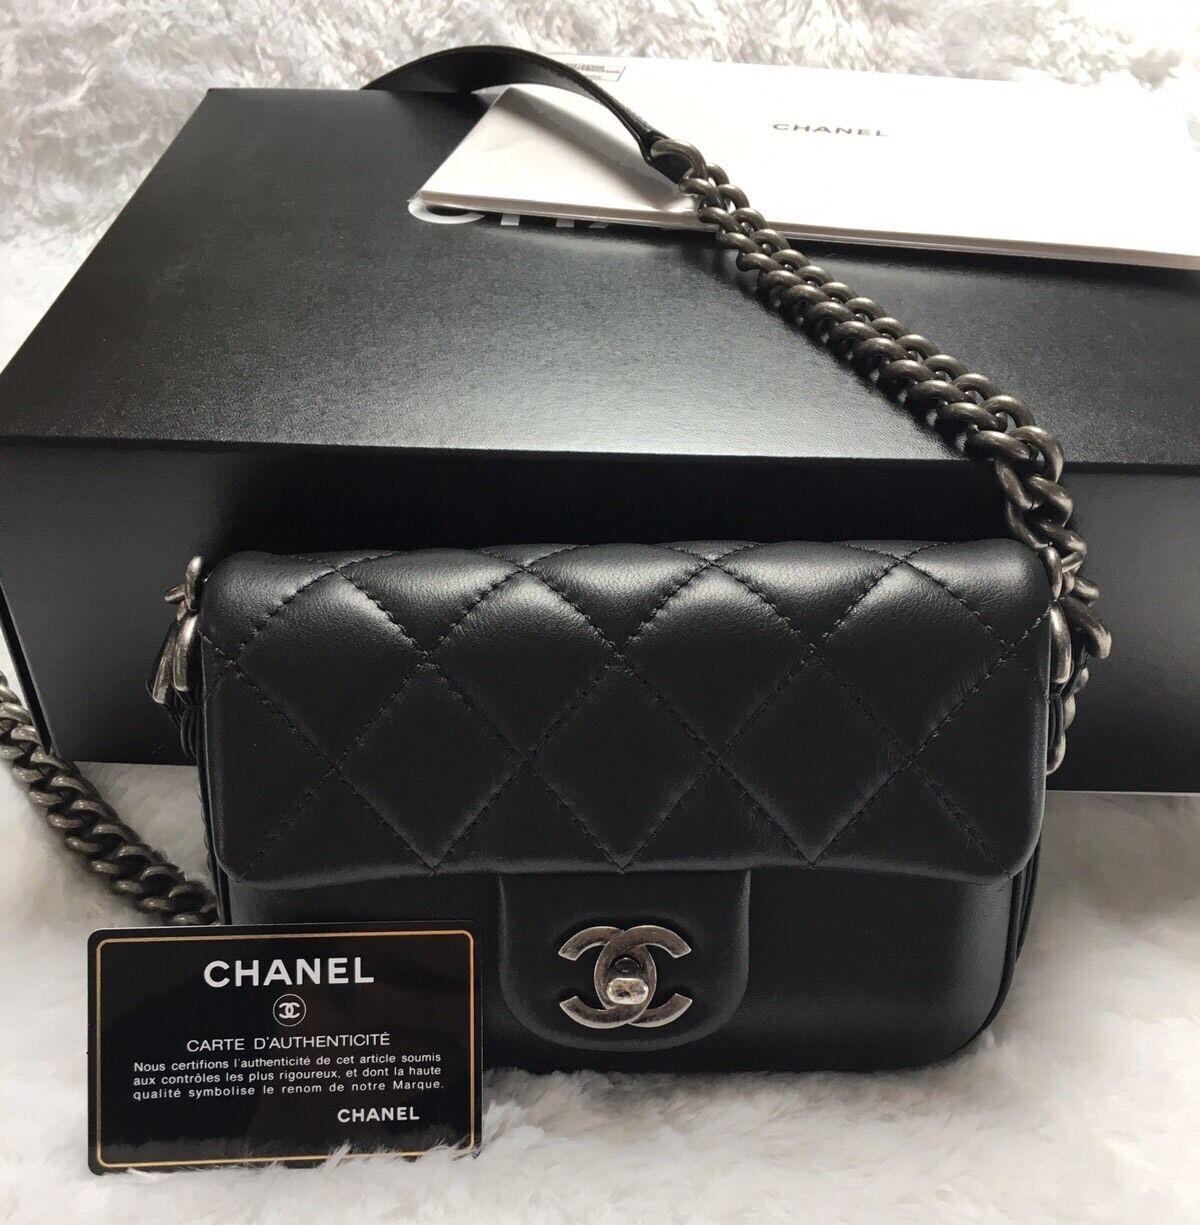 a5b9ca7f4210 Chanel Rock my Shoulder Flap Bag Black Calfskin | Bag in 2019 | Bags ...